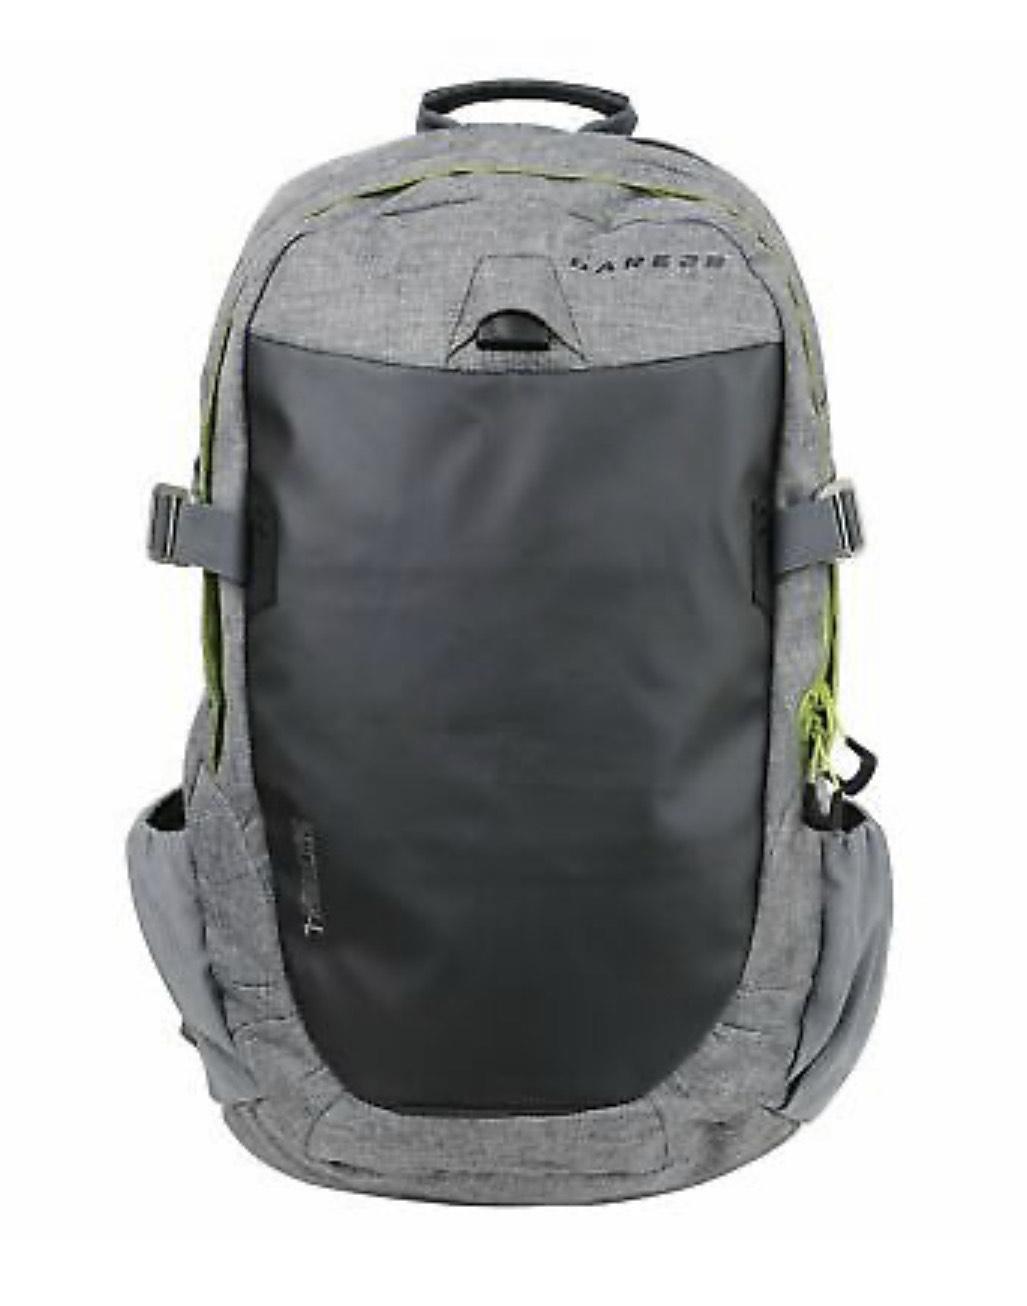 Dare2b Unisex Krosfire 16 Litre Rucksack Bag Grey/Lime £14.99 @ portstewart-clothing-company eBay